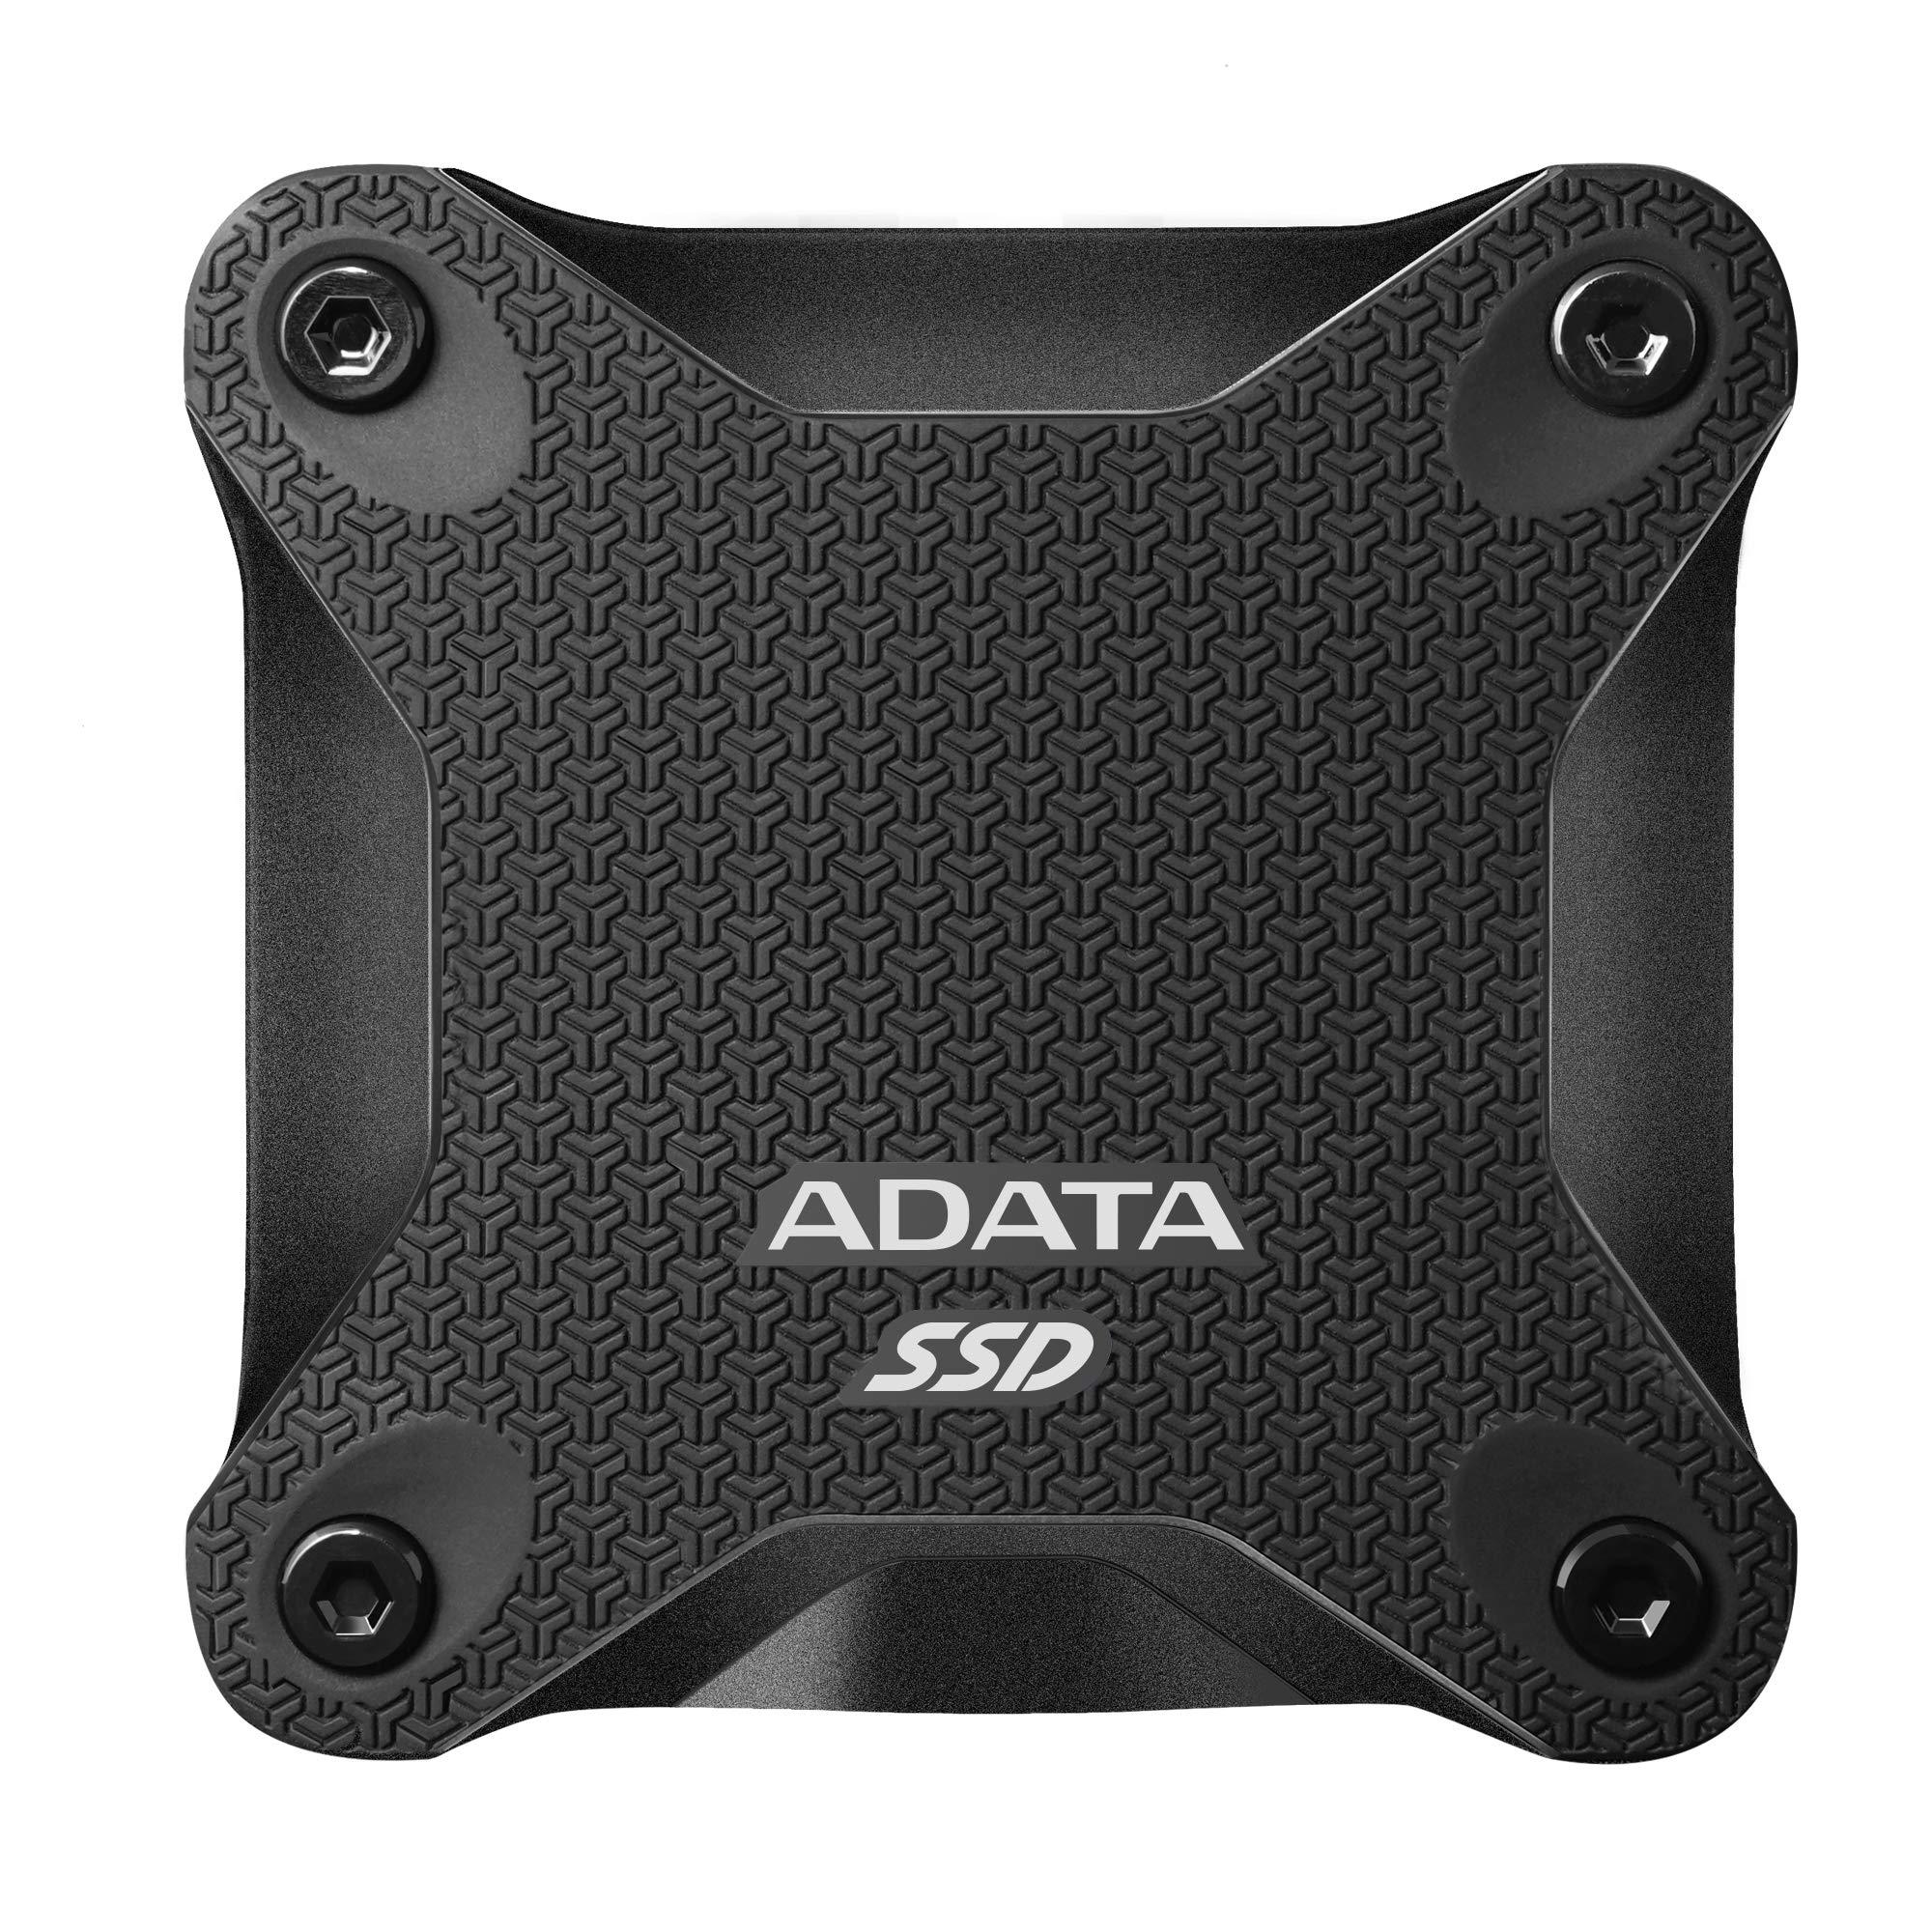 ADATA SD600Q 480GB 3D NAND USB3.2 Ultra-Speed External Solid State Drive Read up to 440 MB/s Black (ASD600Q-480GU31-CBK)